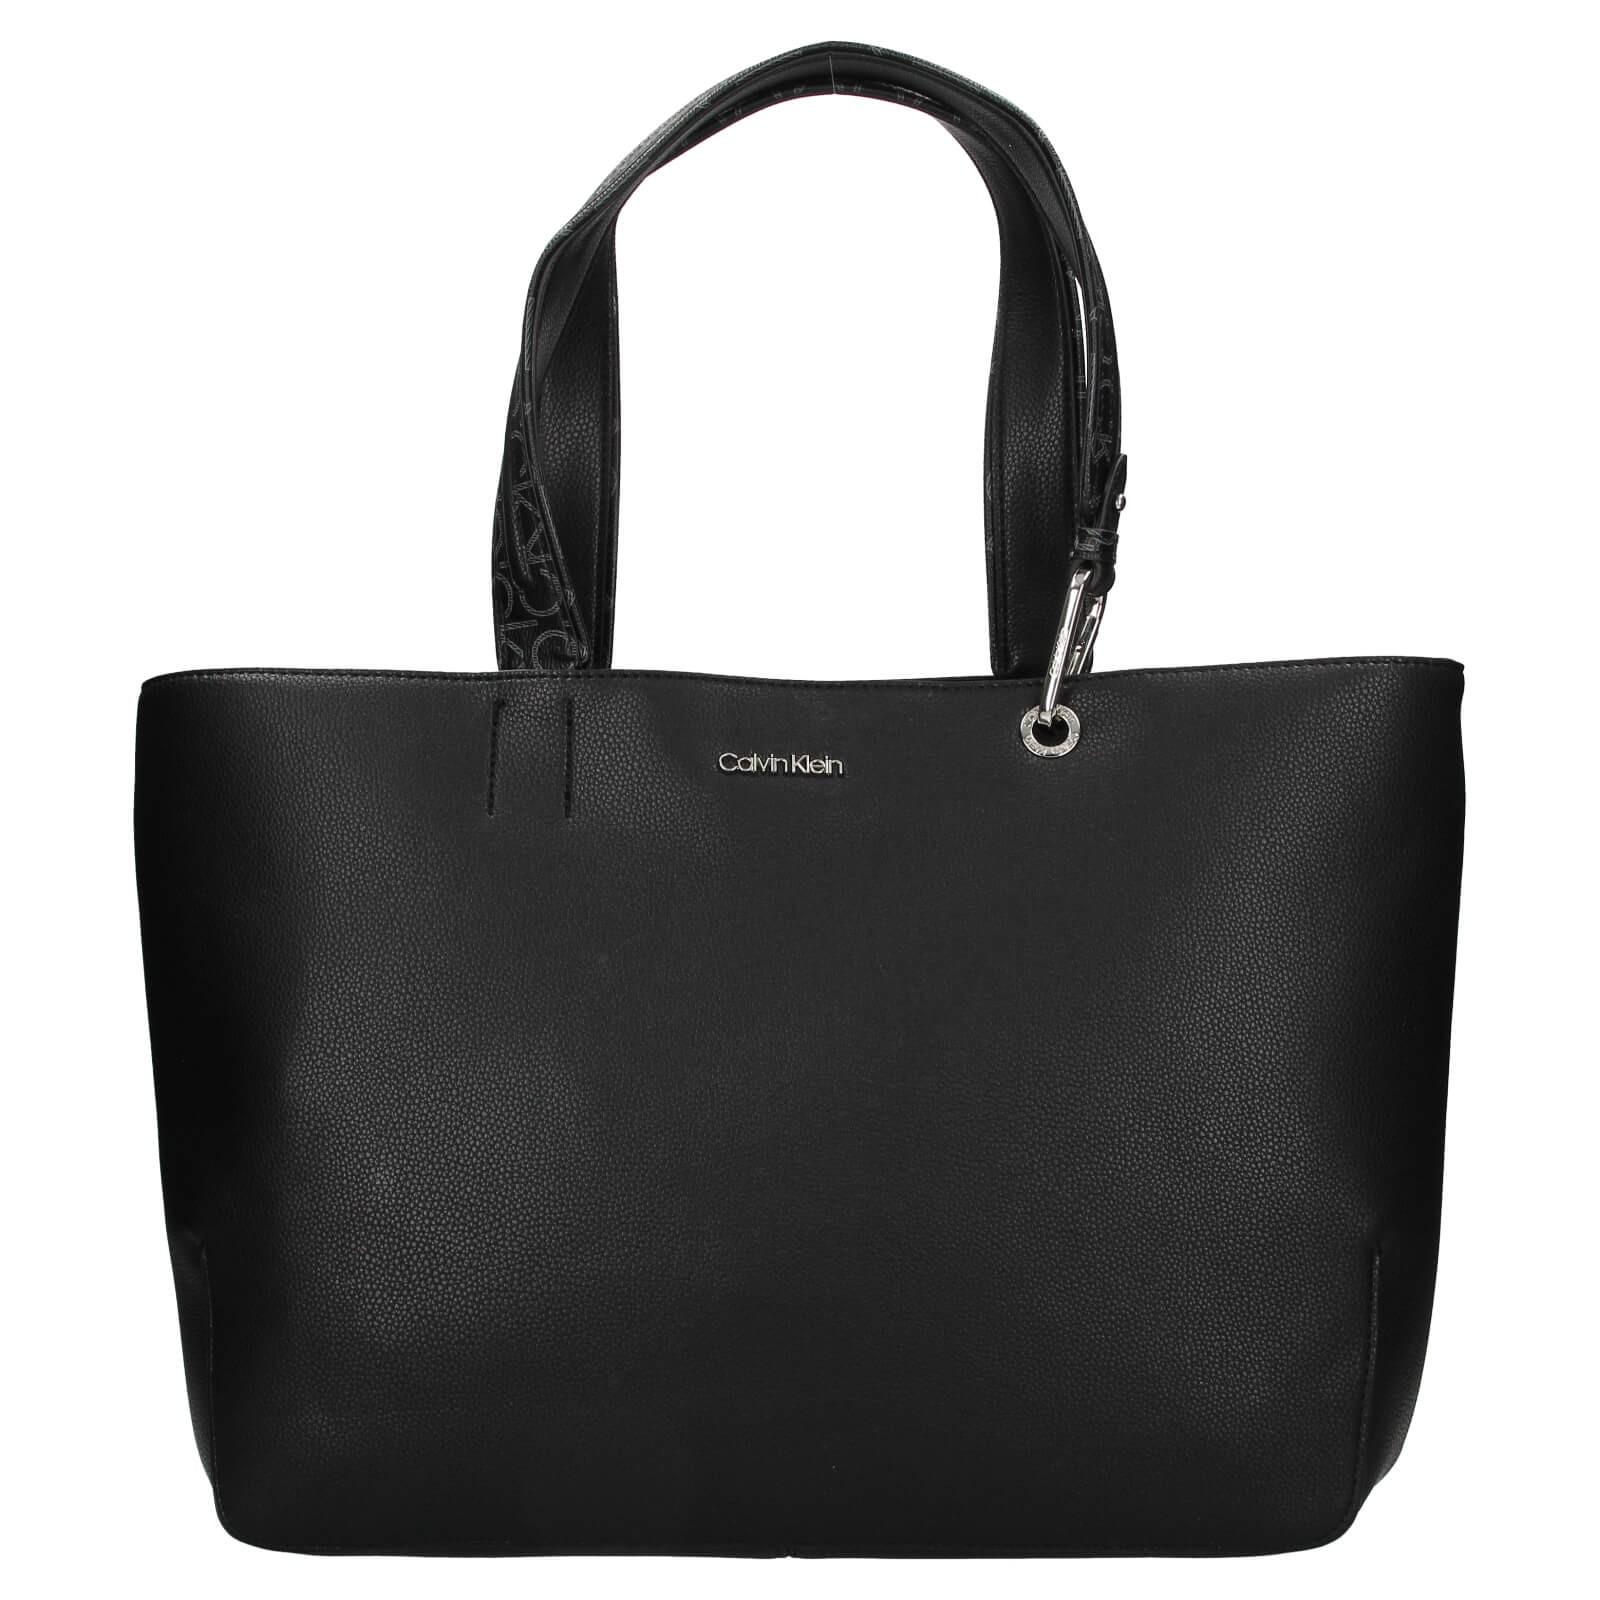 Dámska kabelka Calvin Klein Balla - čierna